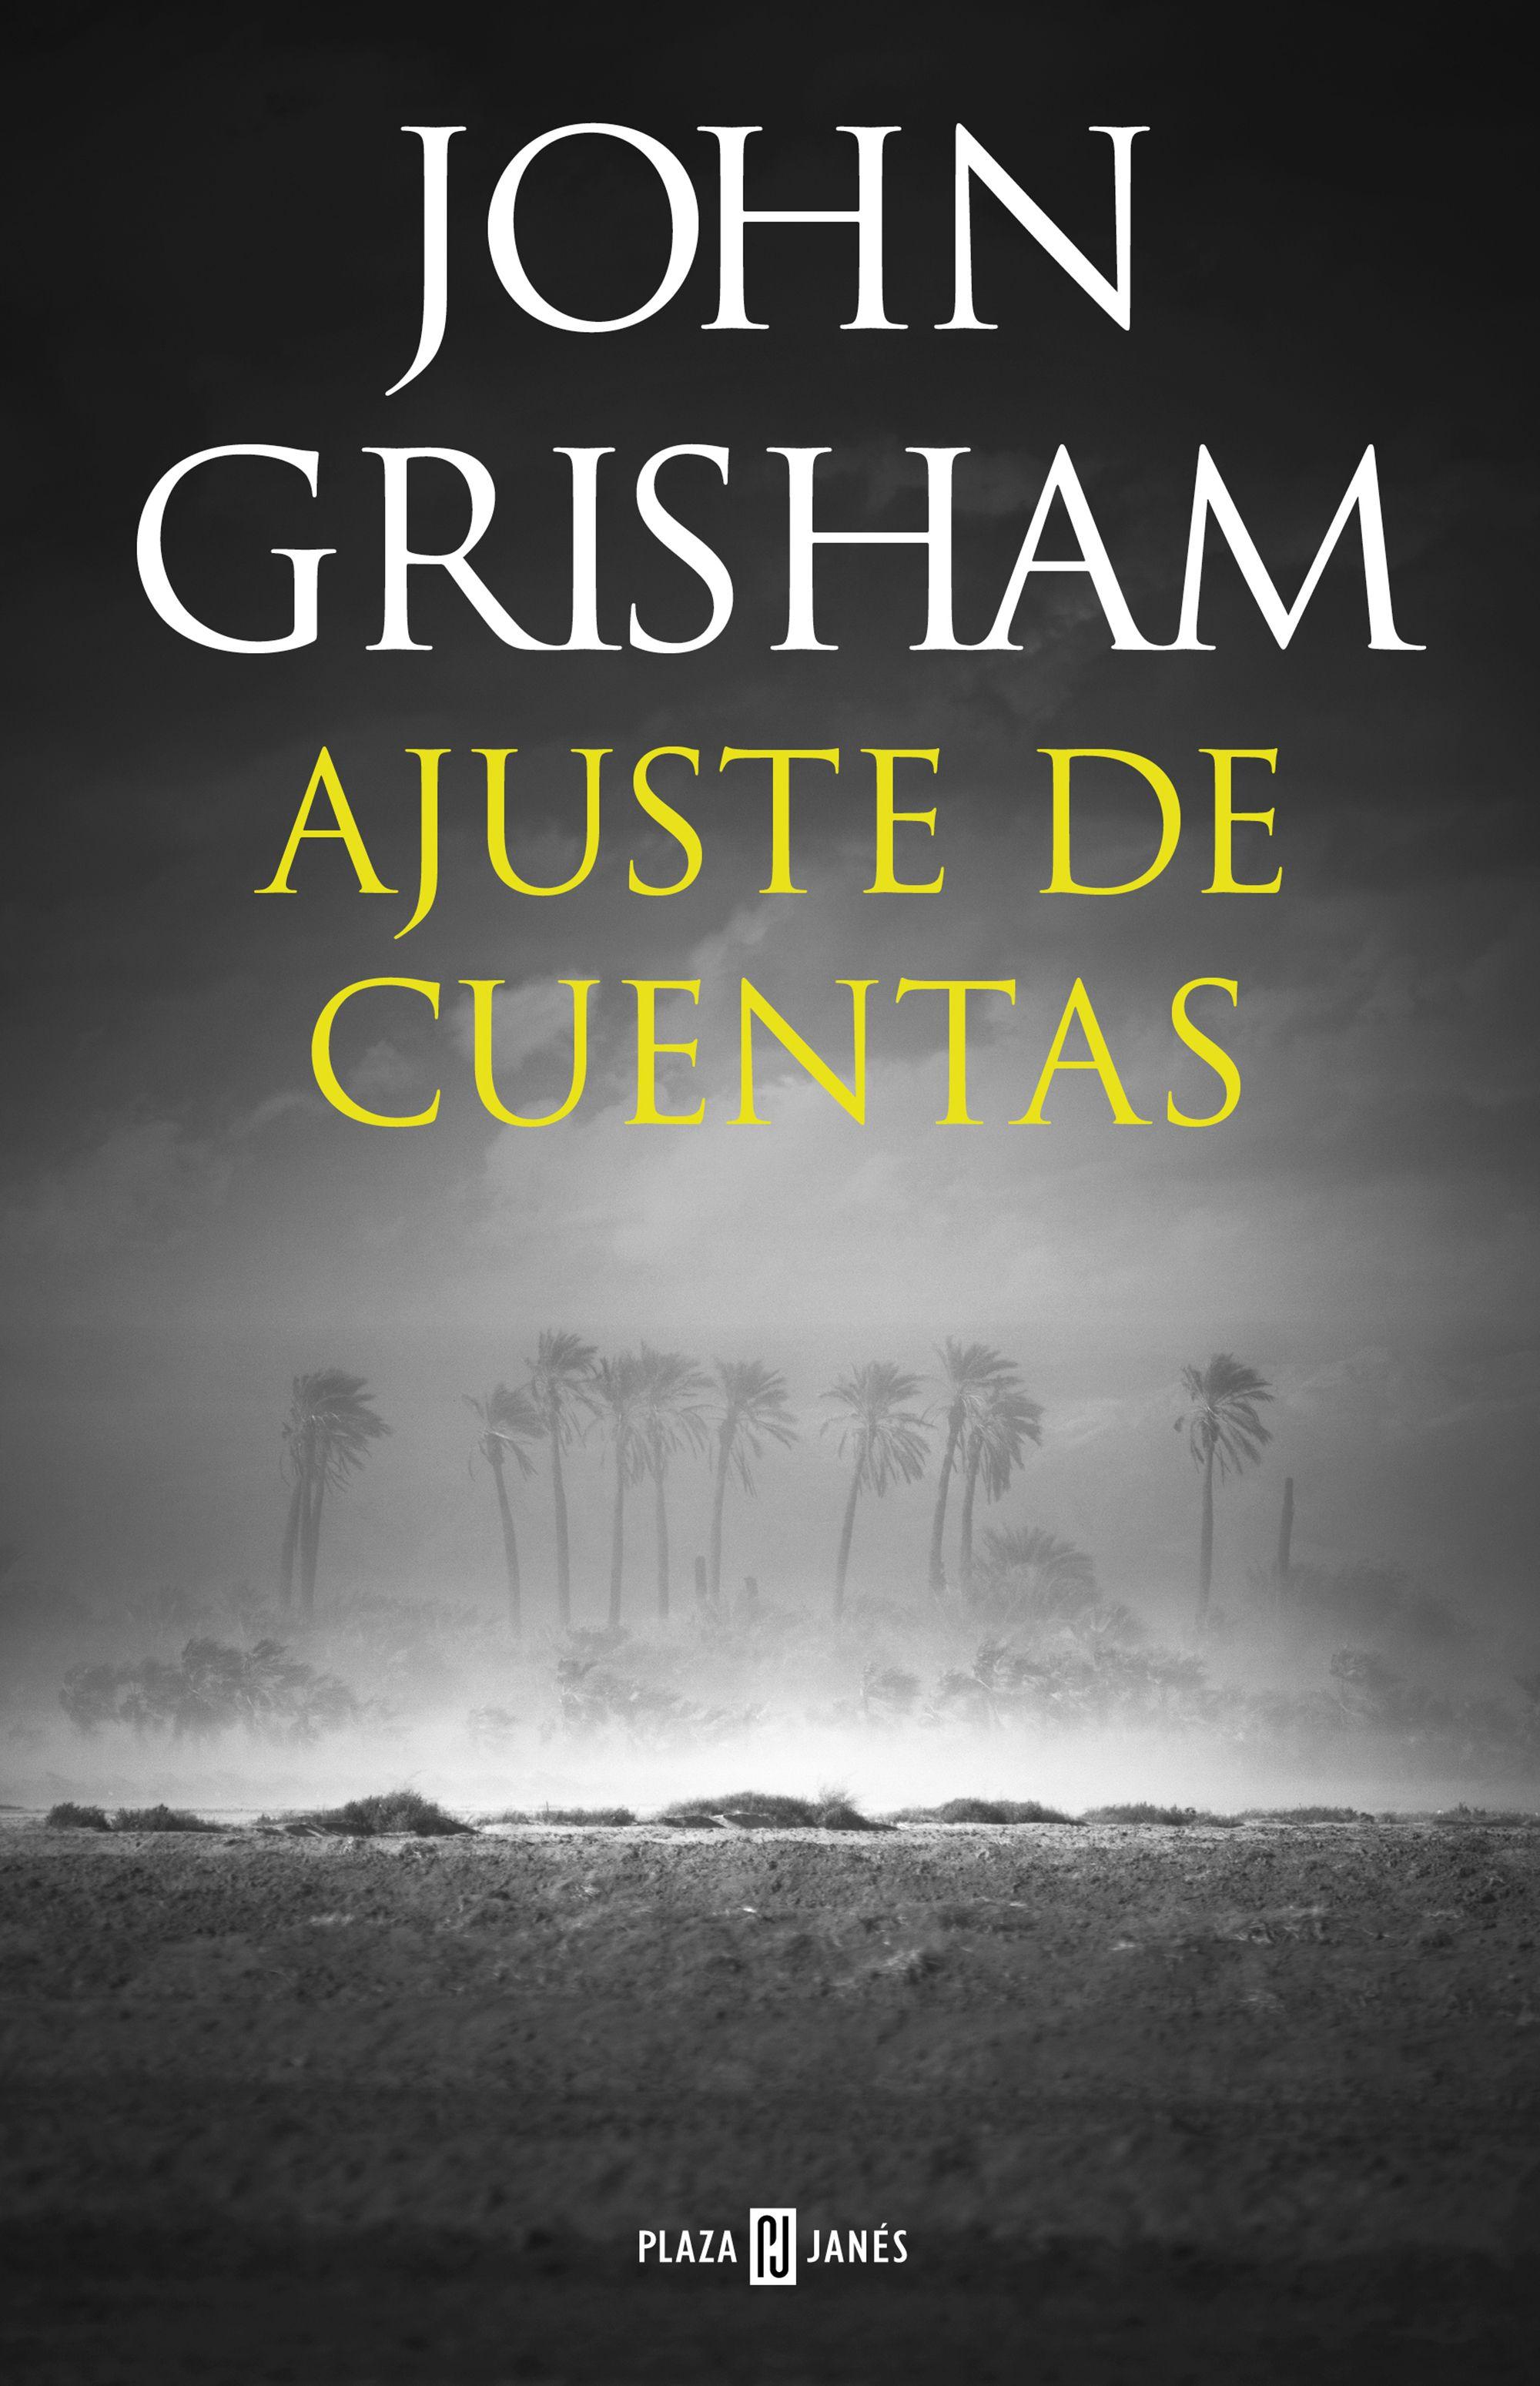 Ajuste De Cuentas John Grisham Juliol In 2020 John Grisham John Grisham Books Novels